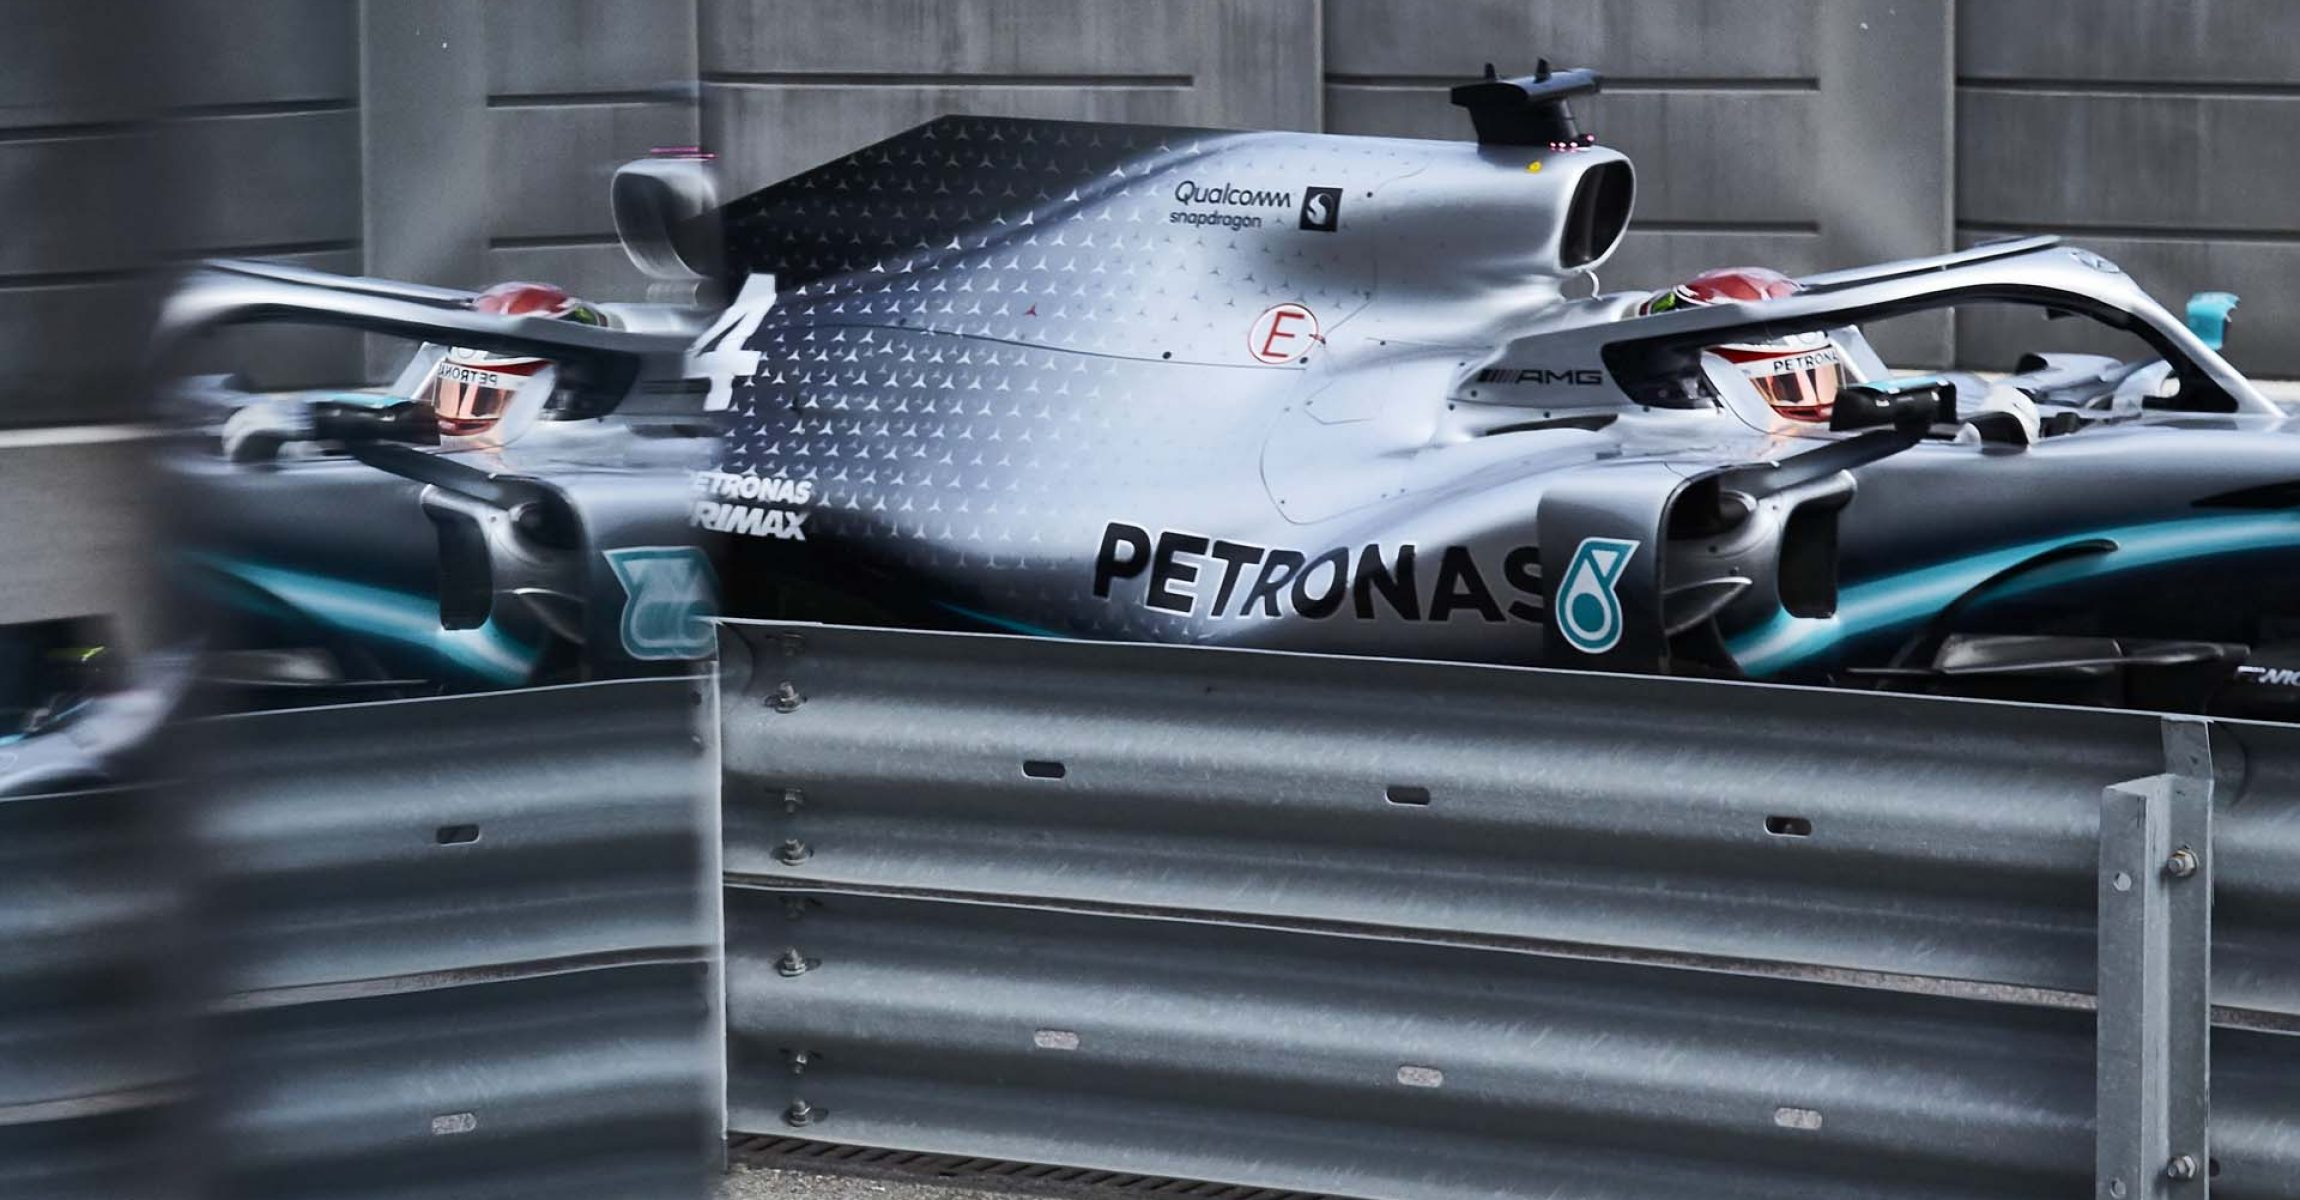 2019 Russian Grand Prix, Friday - Steve Etherington Lewis Hamilton Mercedes